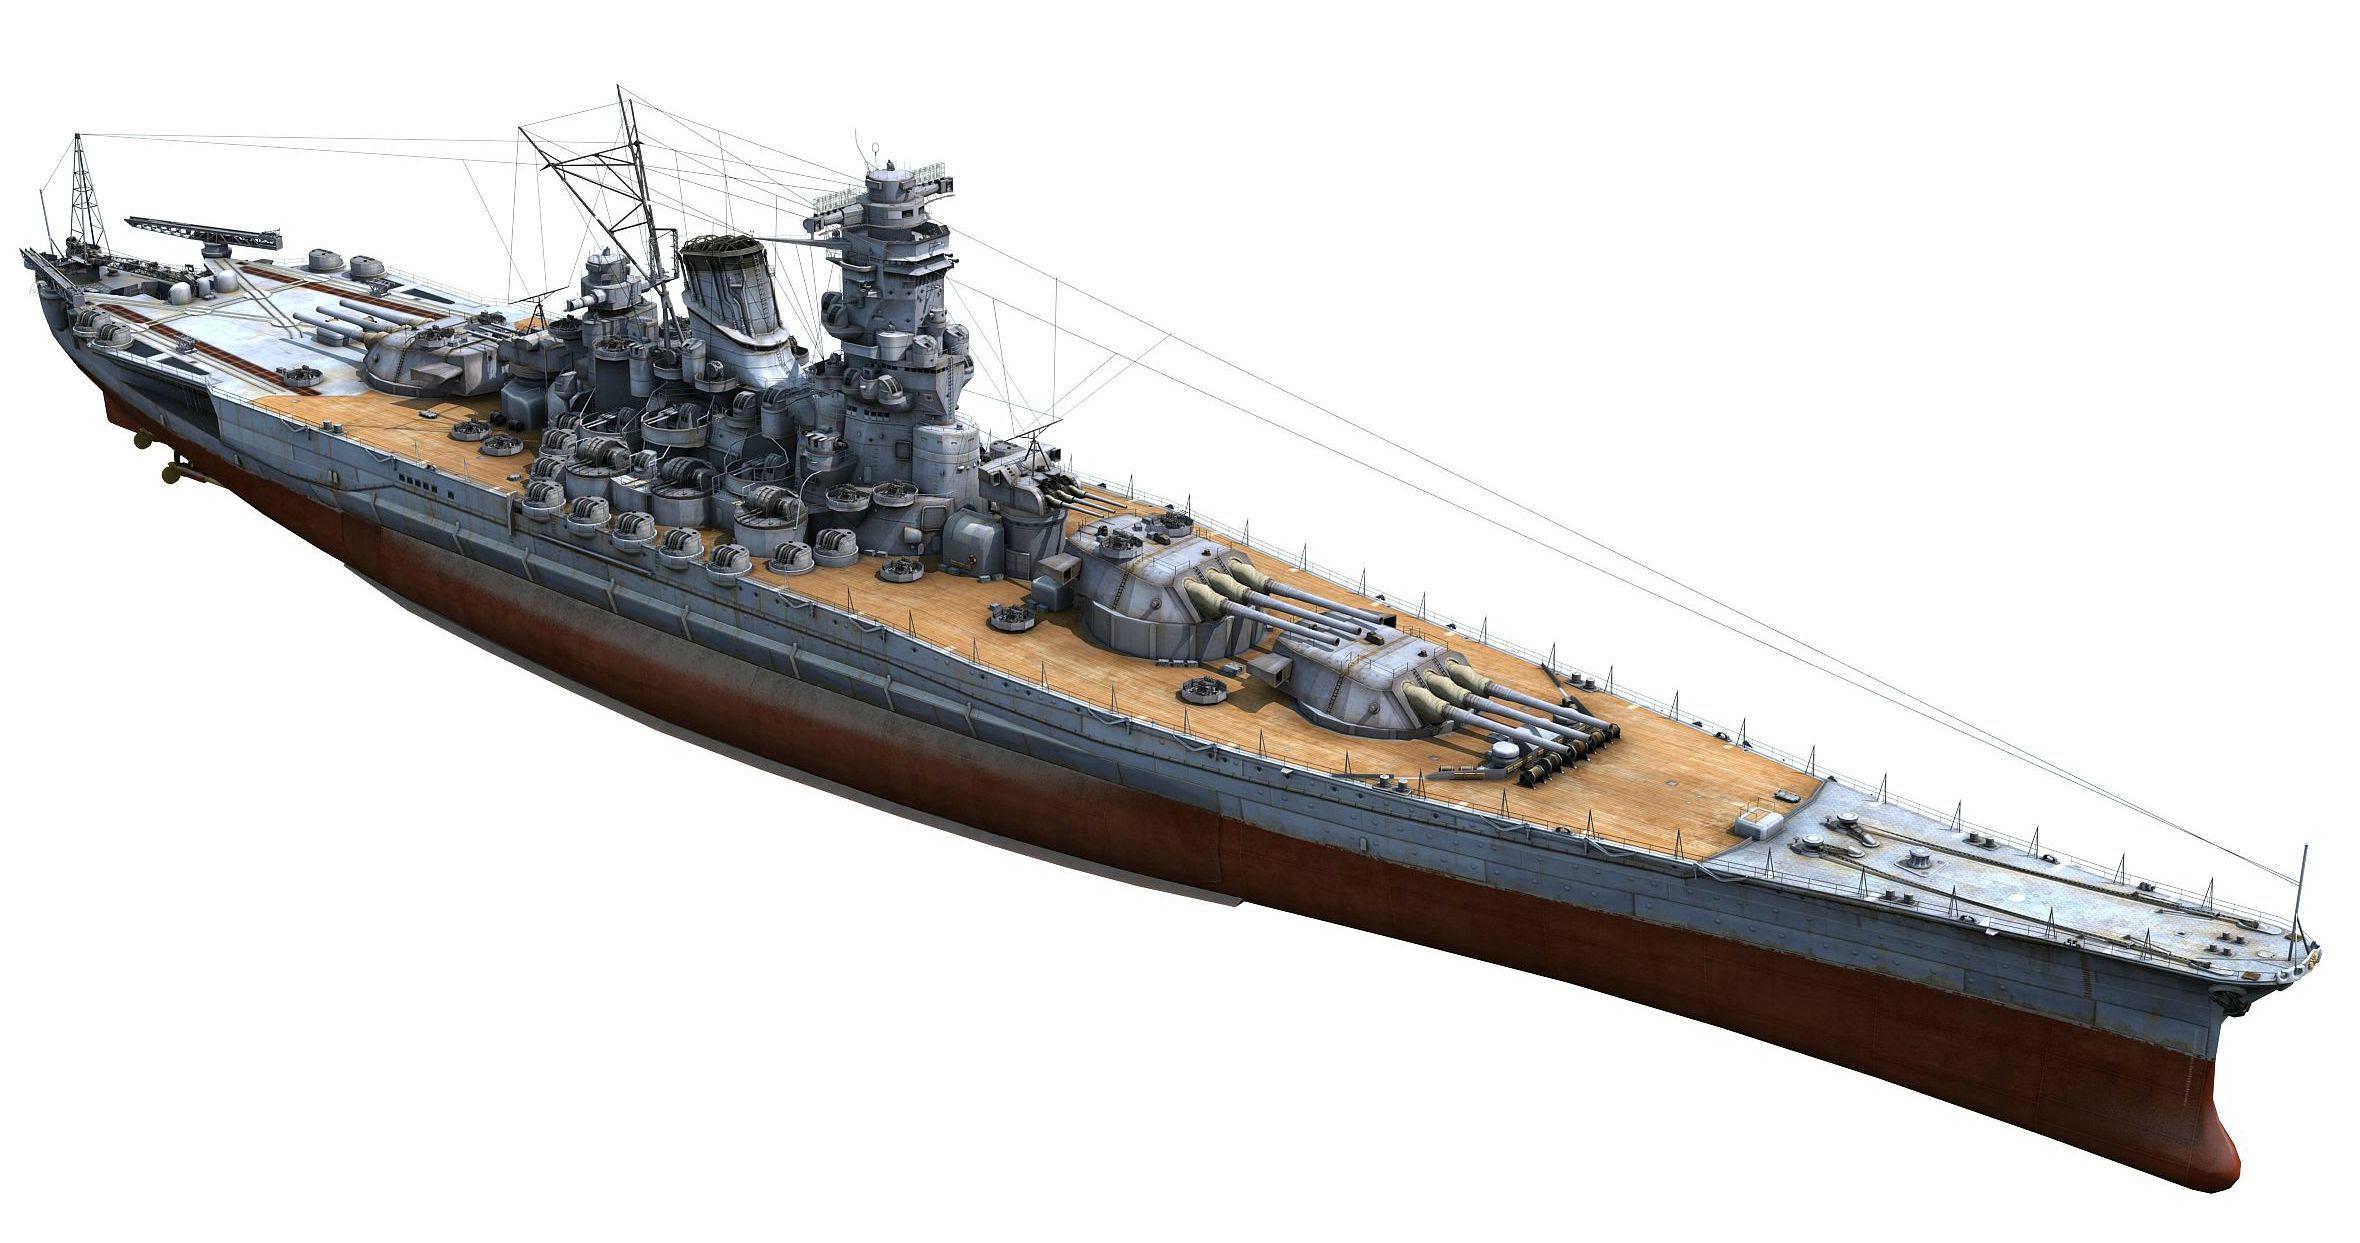 World of Warships Yamato Wallpaper - WallpaperSafari